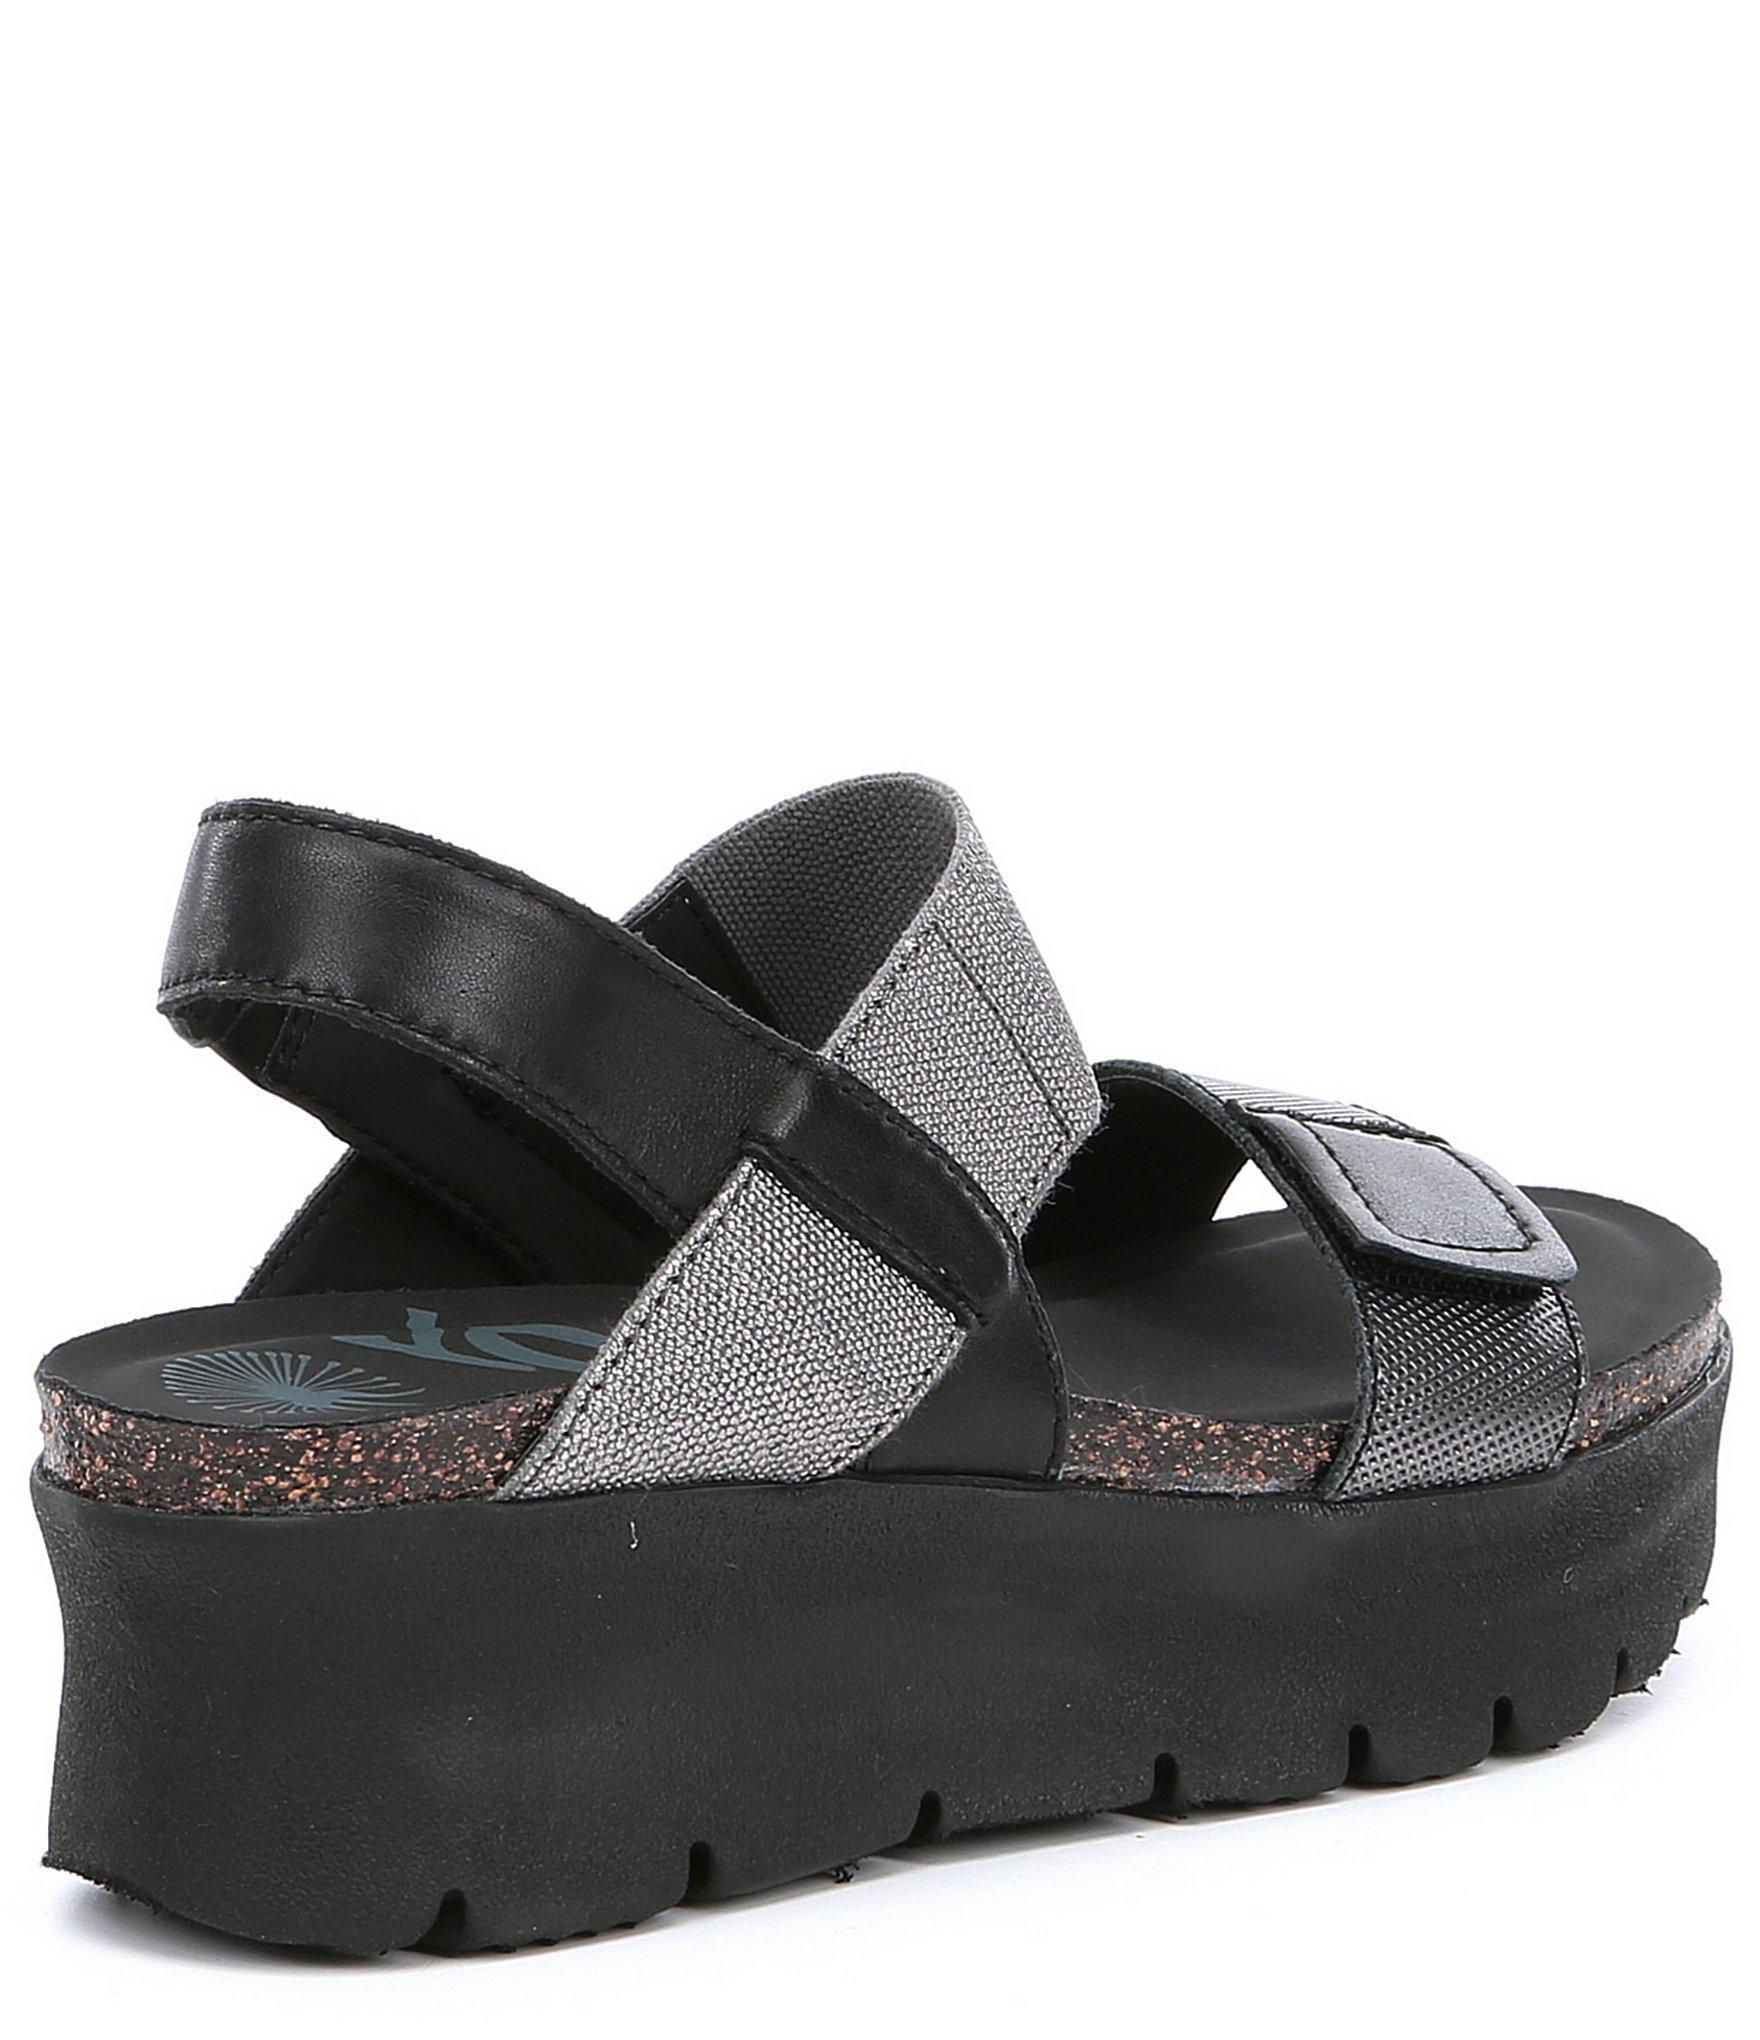 328c1fded7 Otbt - Black Nova Women's Platform Sandals - Lyst. View fullscreen